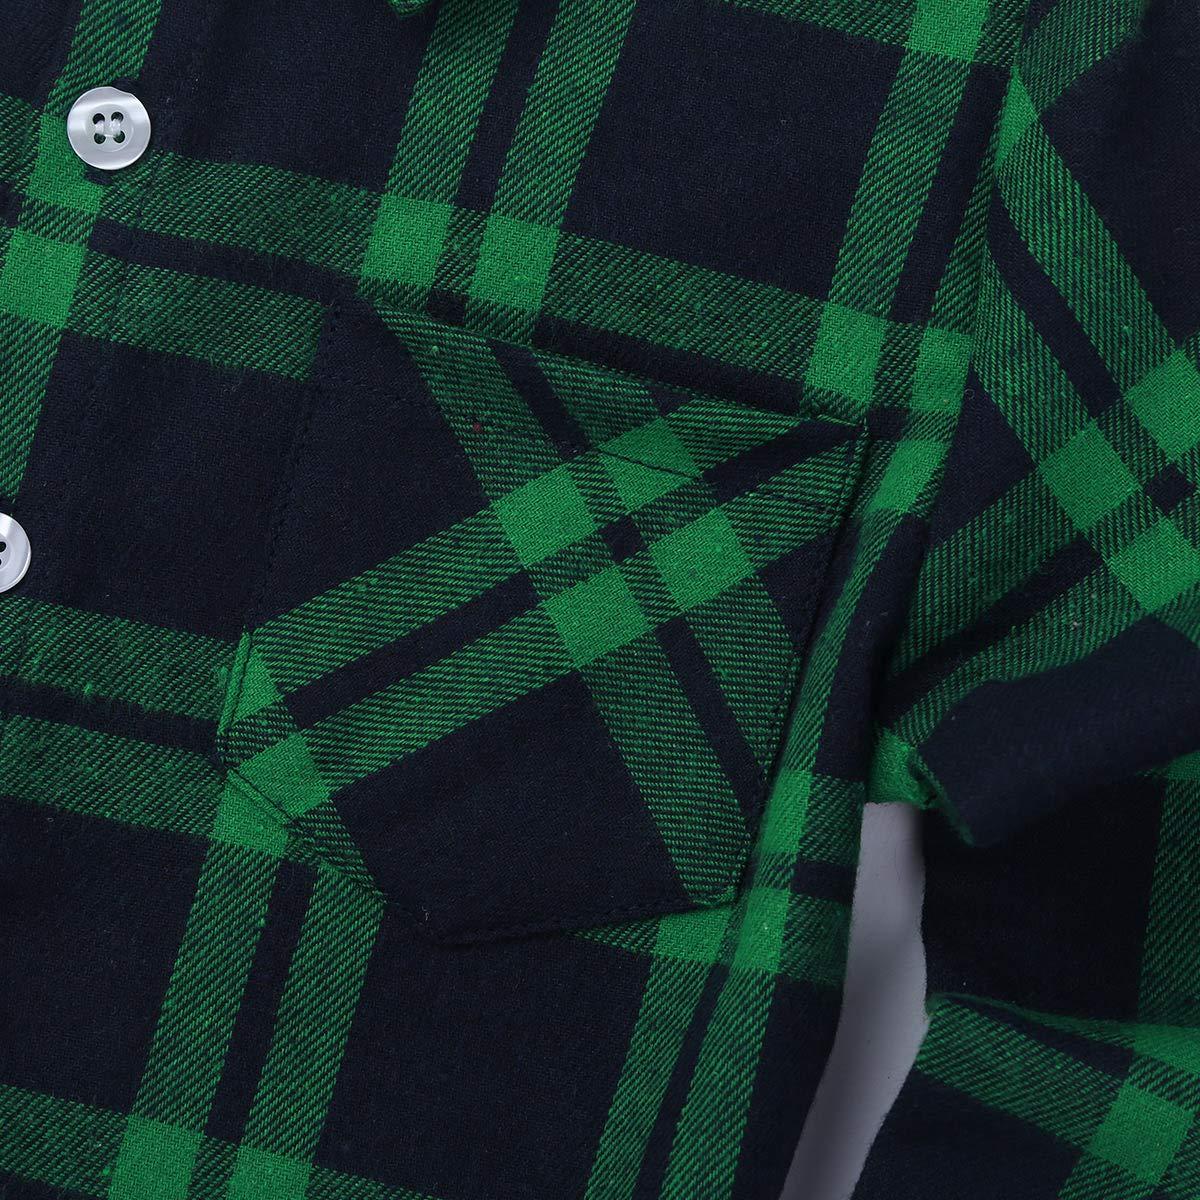 Freebily Unisex Boys Girls Long Sleeve Plaid Button Down Callored Shirt School Daily Casual Tops